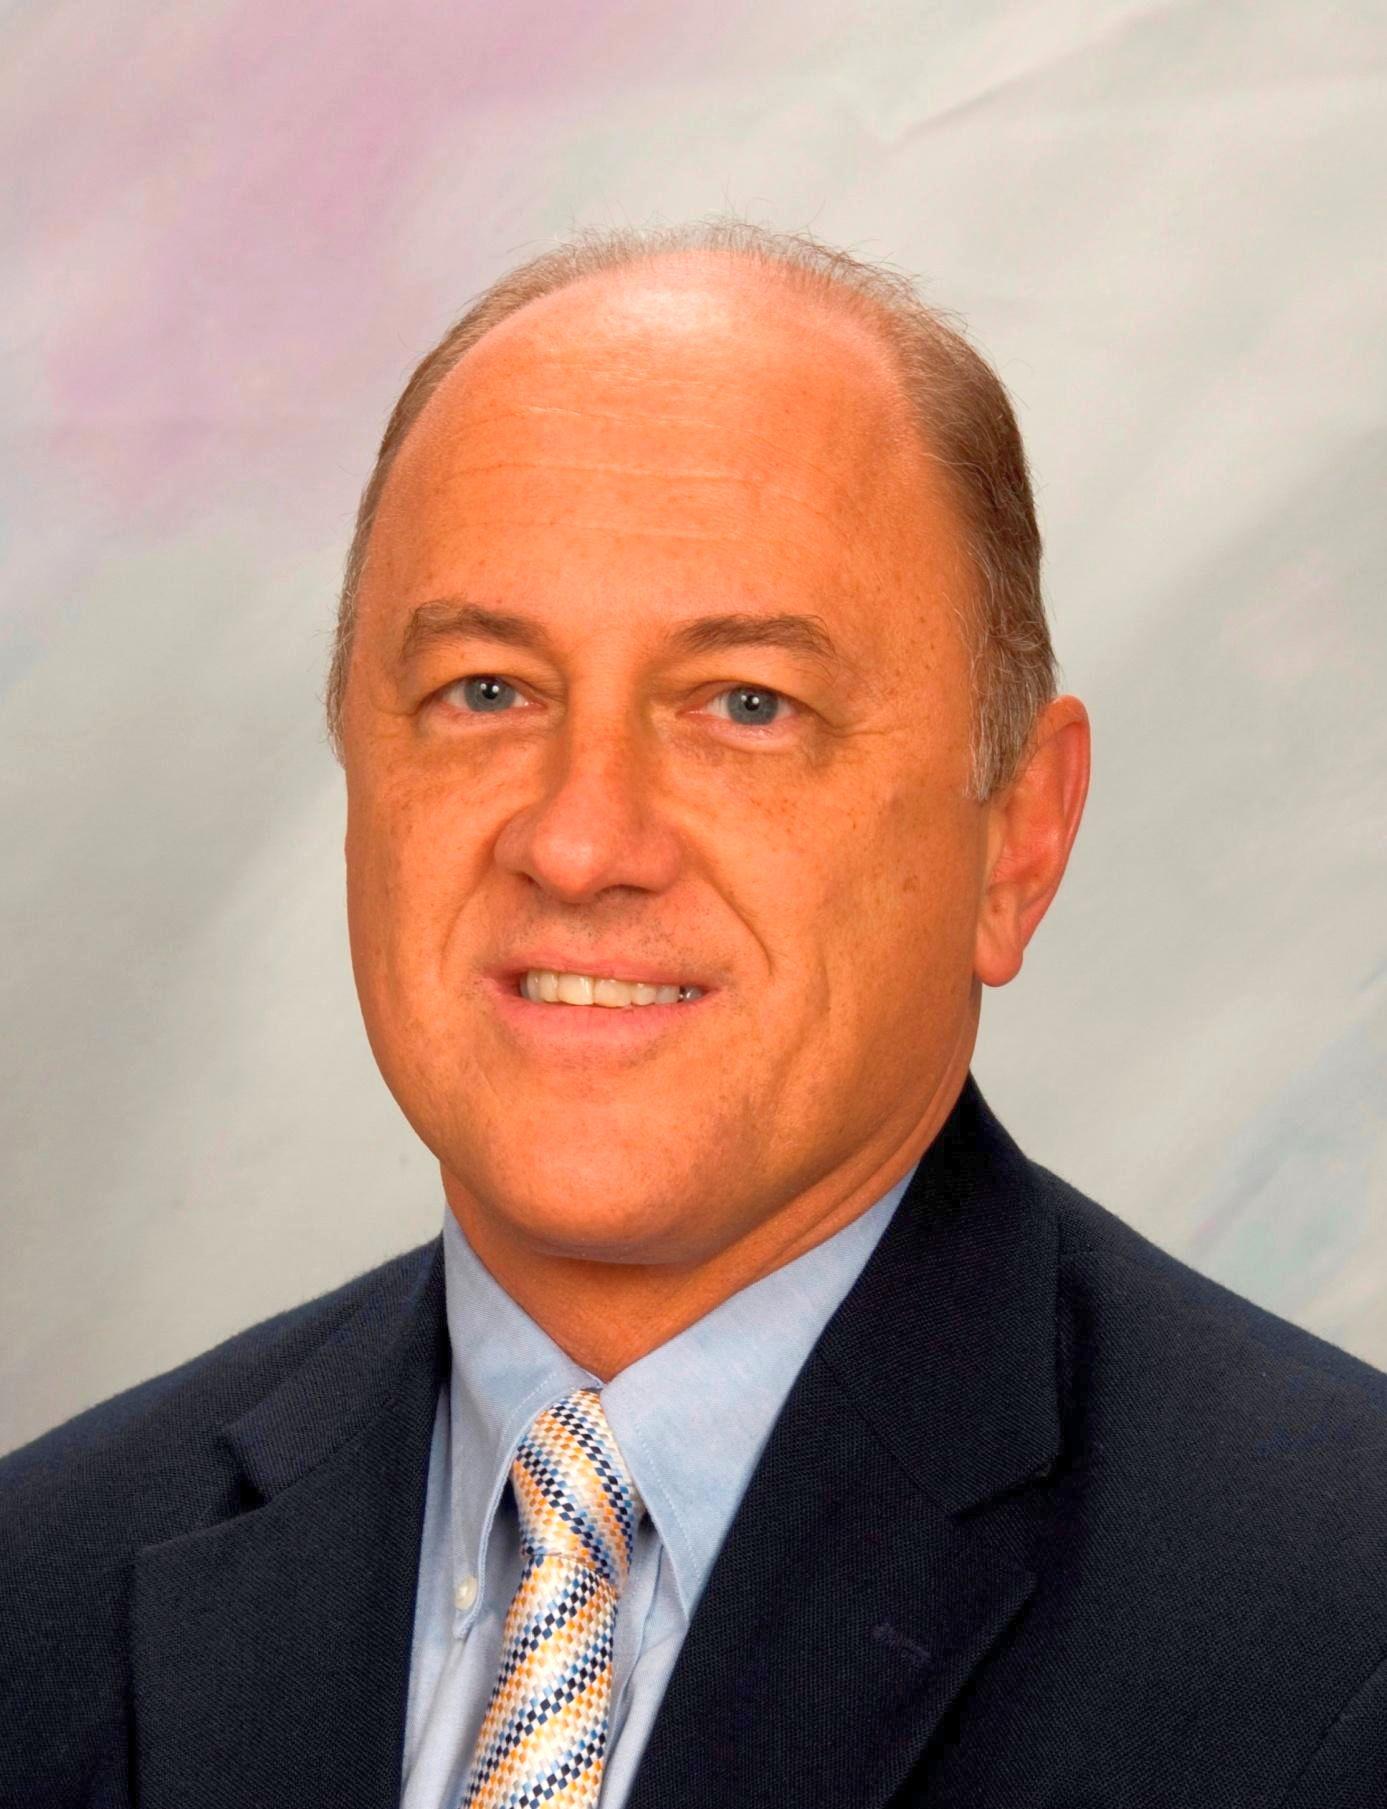 Tom Coba joins Lapels Dry Cleaning as franchise advisor